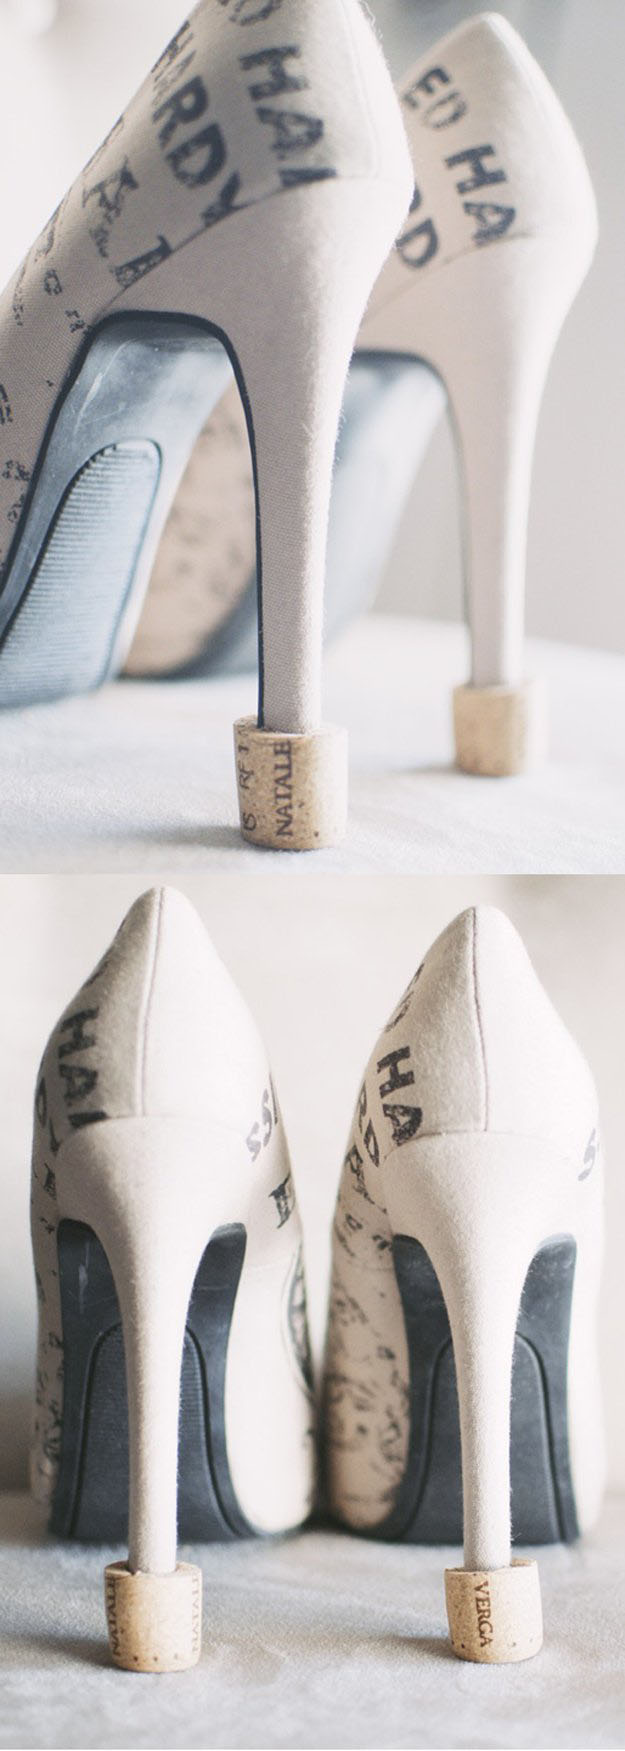 DIY Wine Cork Crafts for Easy Wedding Shoe Ideas - Wine Cork Shoe Savers - DIY Projects & Crafts by DIY JOY #crafts